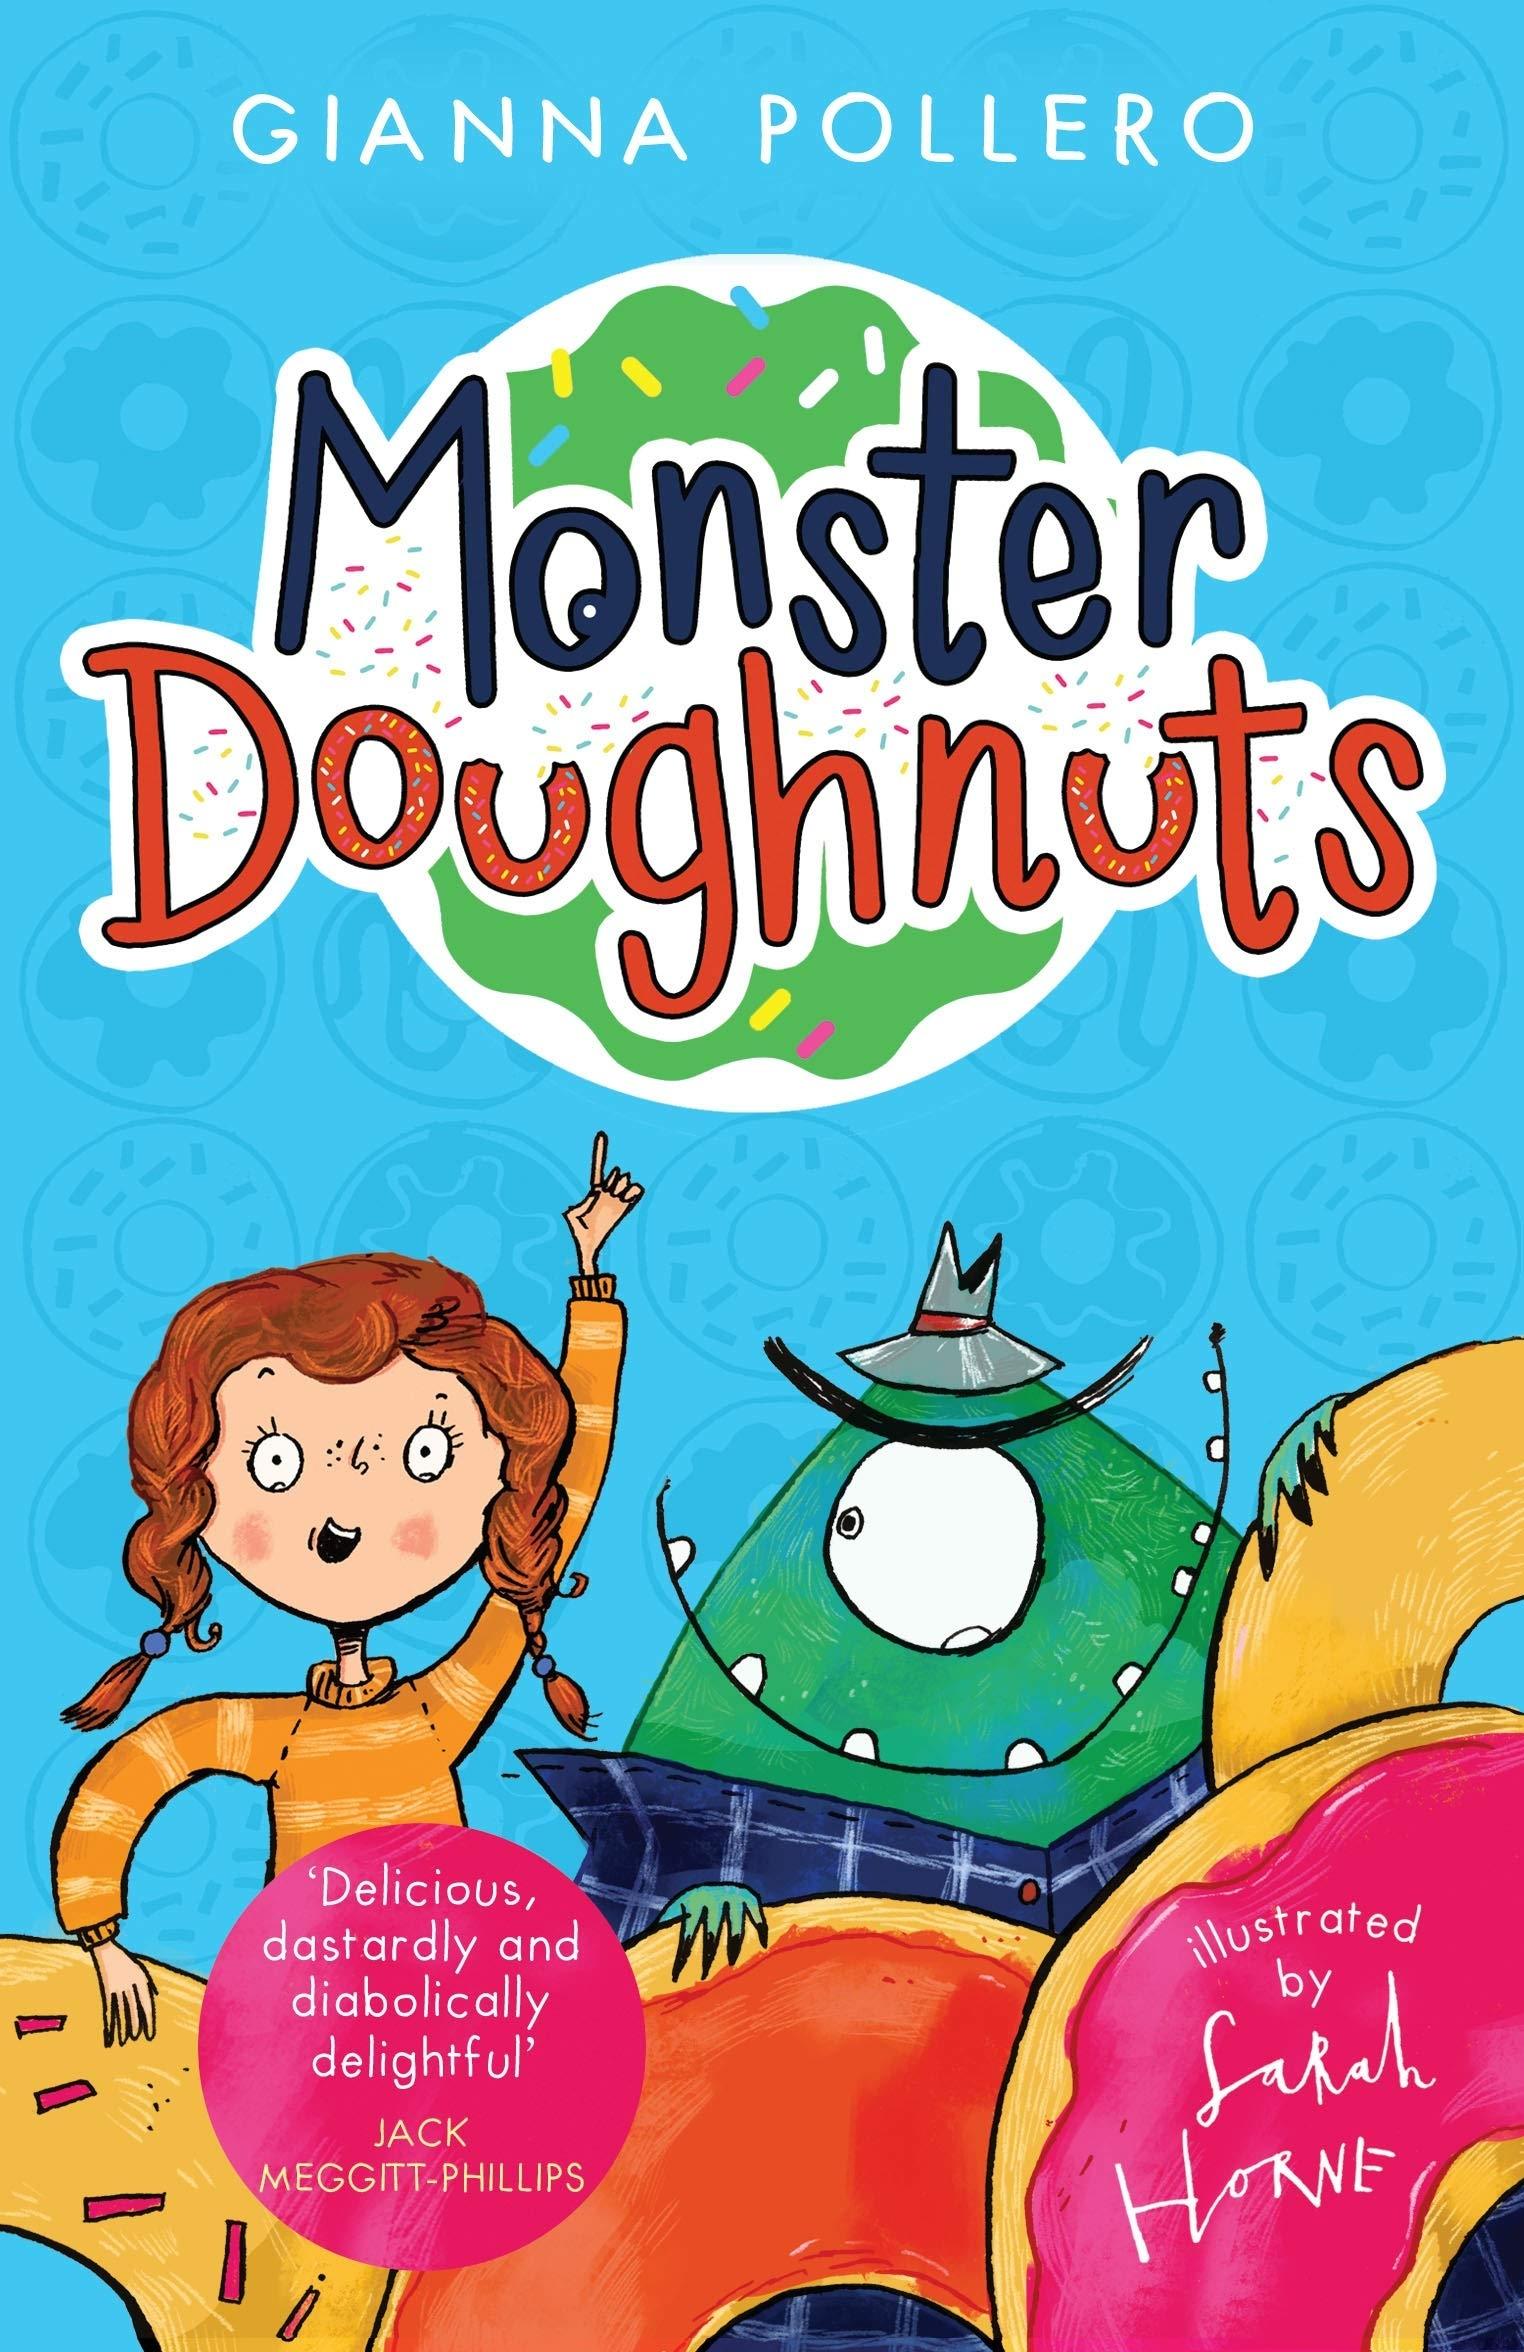 MonsterDoughnuts